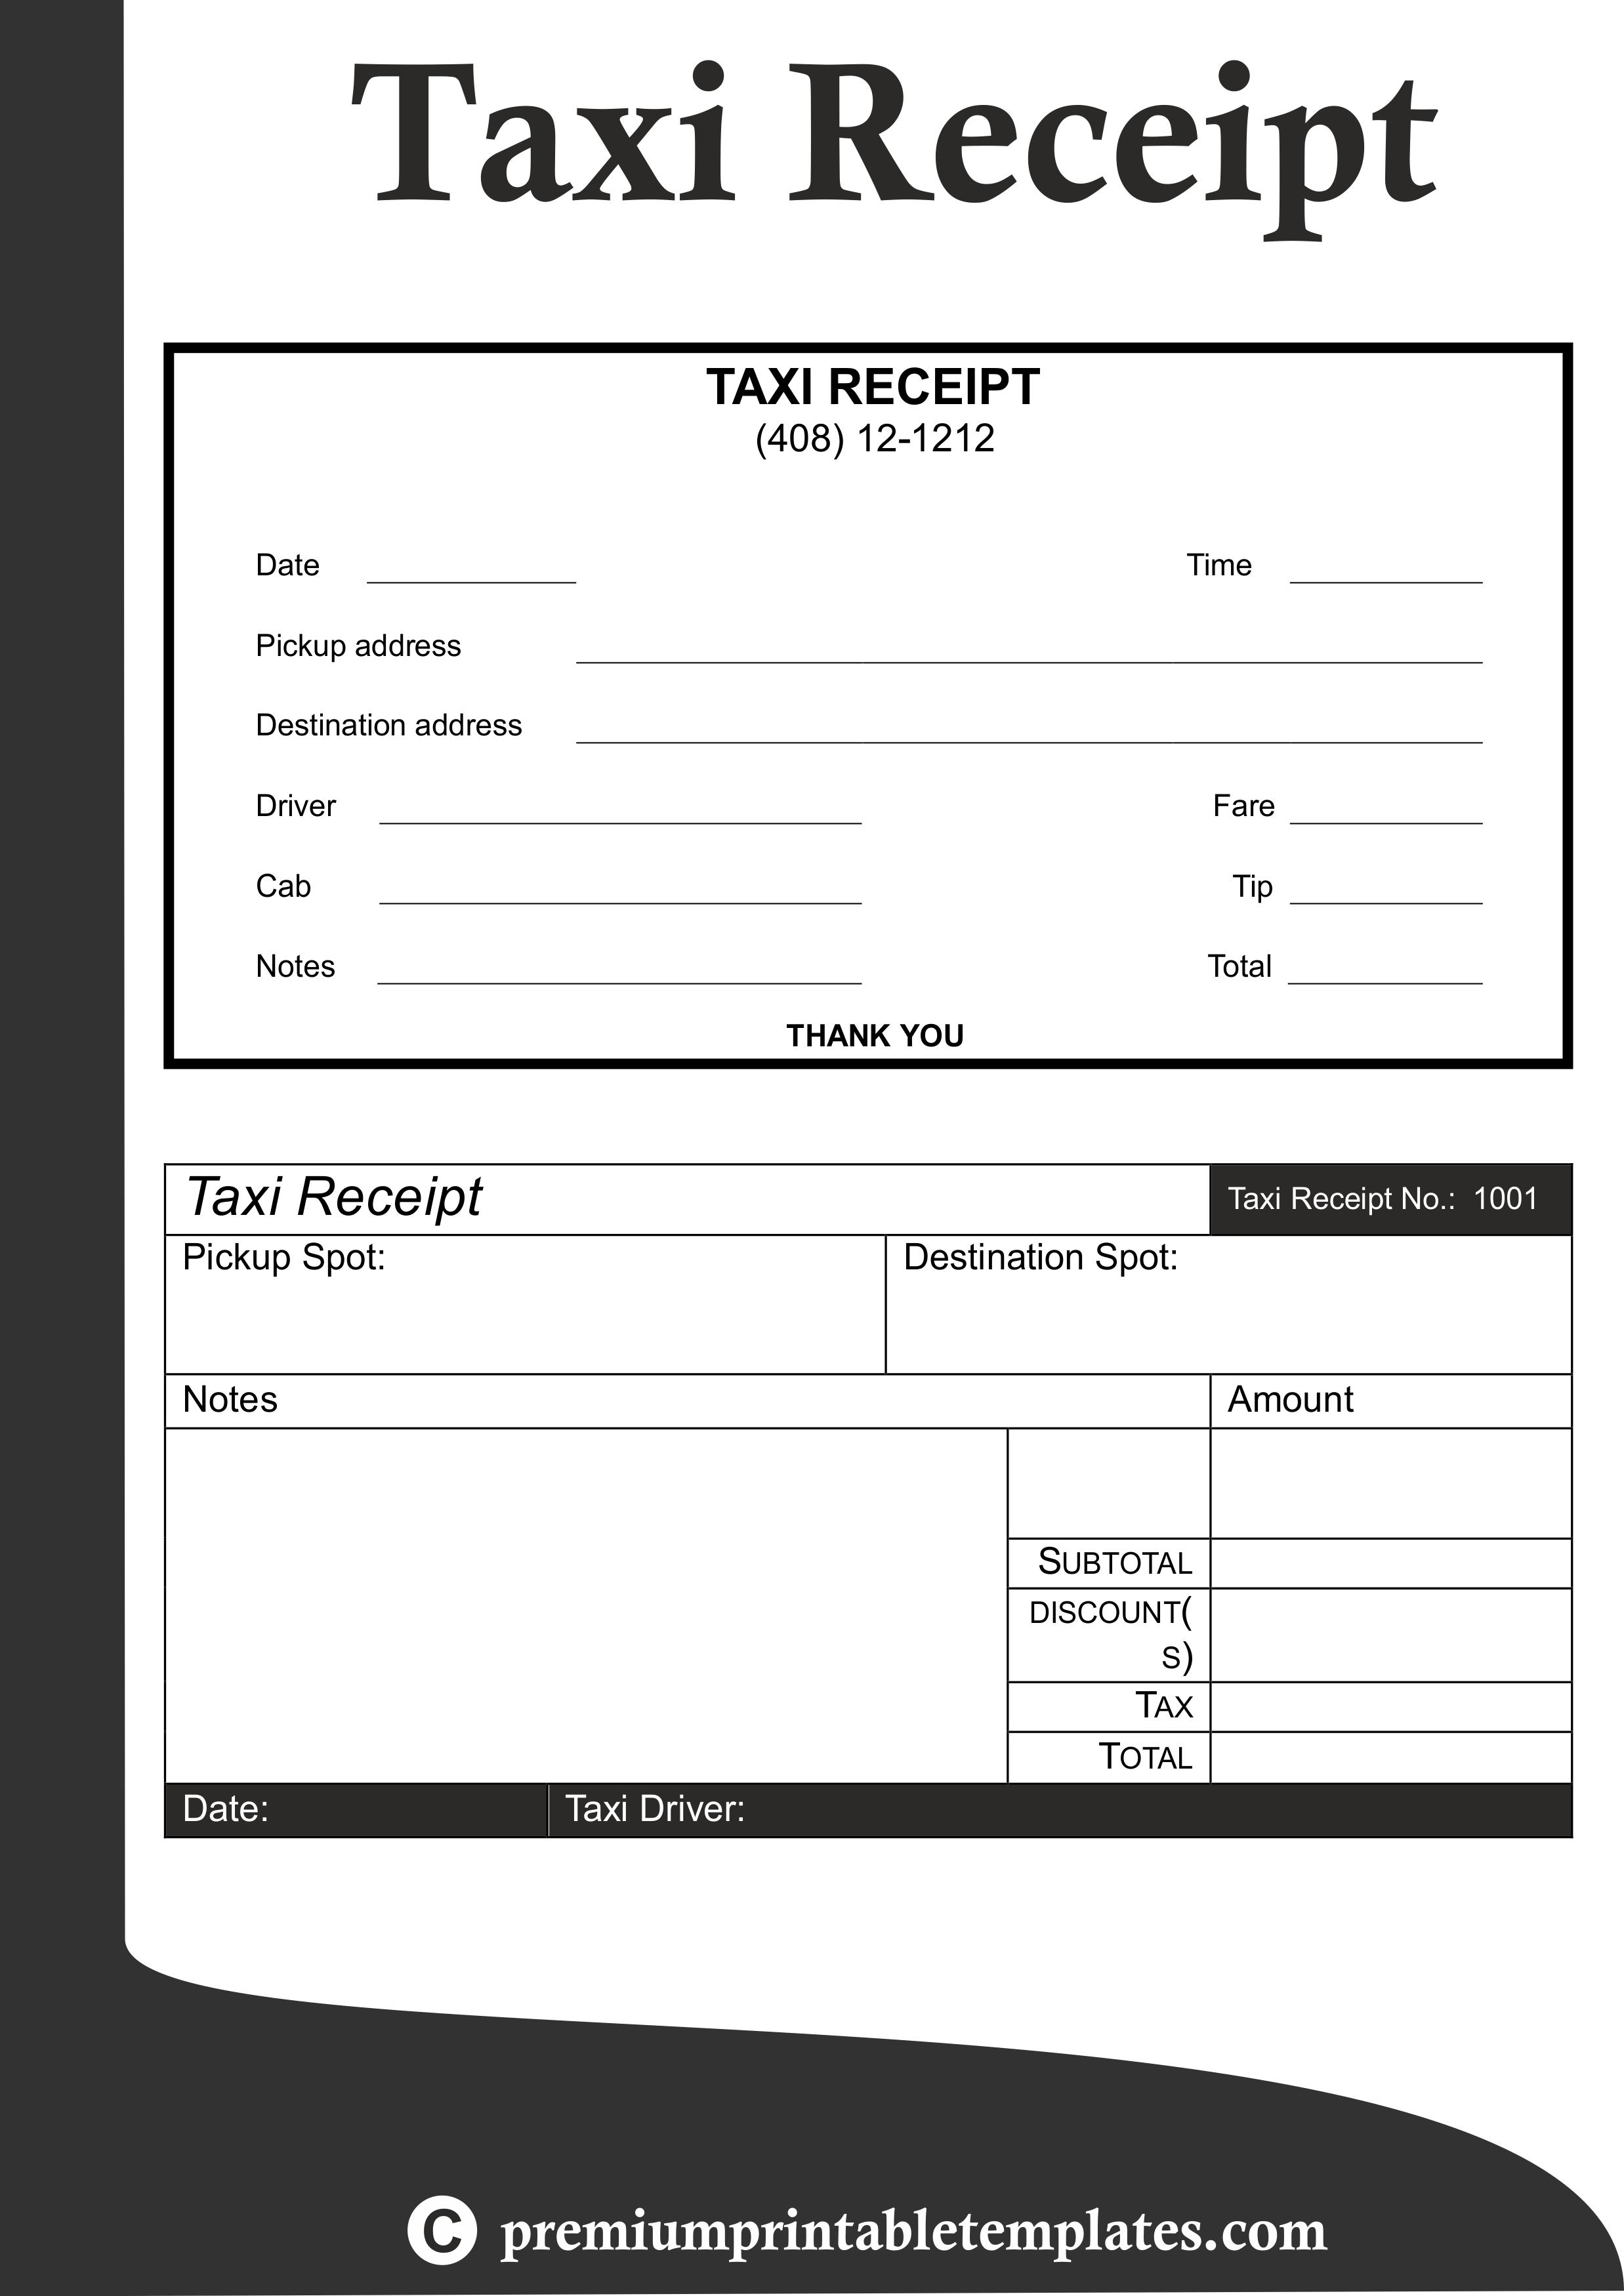 Taxi Receipt Templates  Receipt Templates  Receipt Template Within Blank Taxi Receipt Template